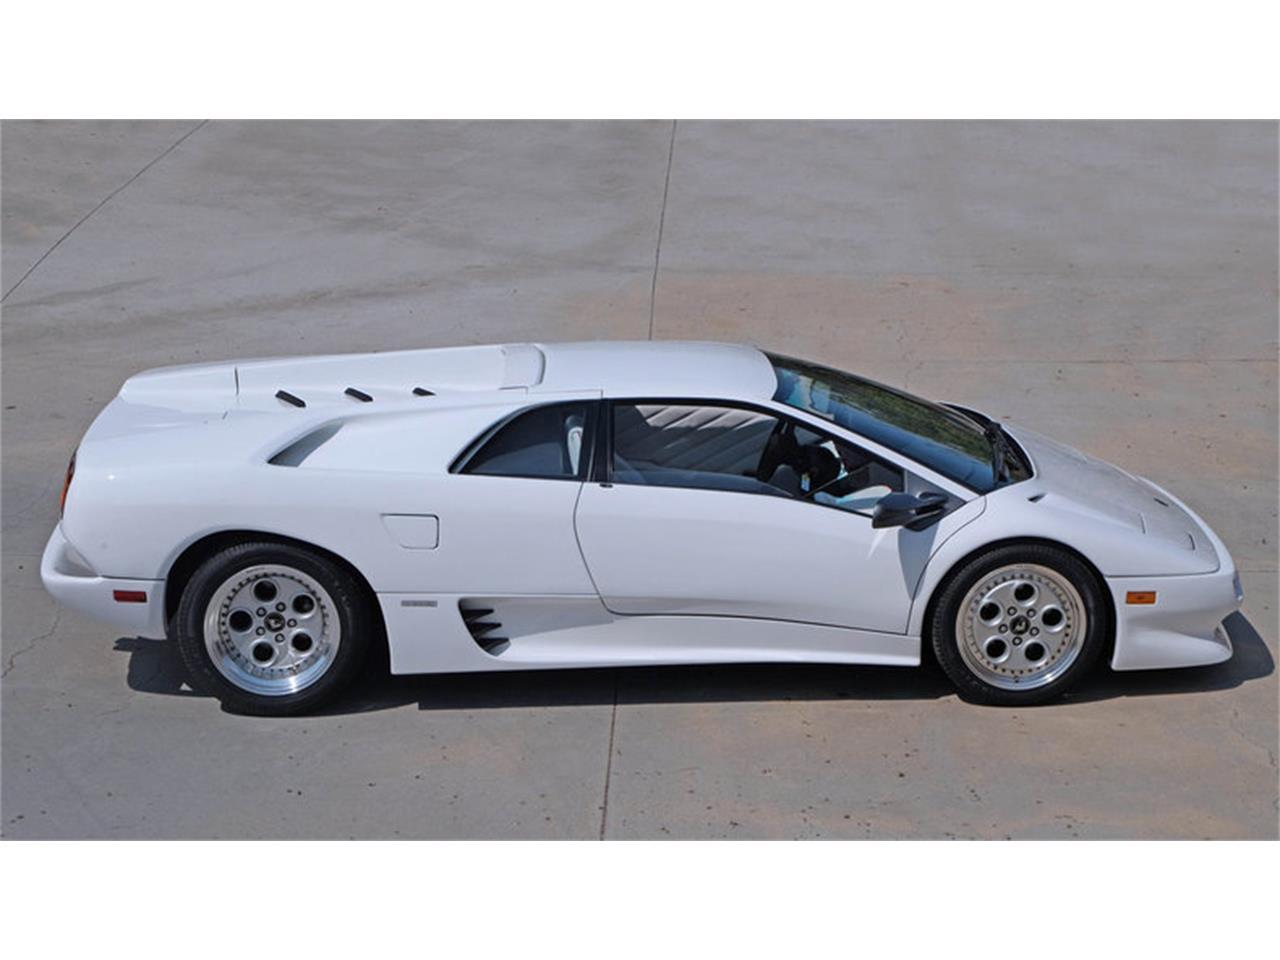 1991 Lamborghini Diablo For Sale Classiccars Com Cc 1033702